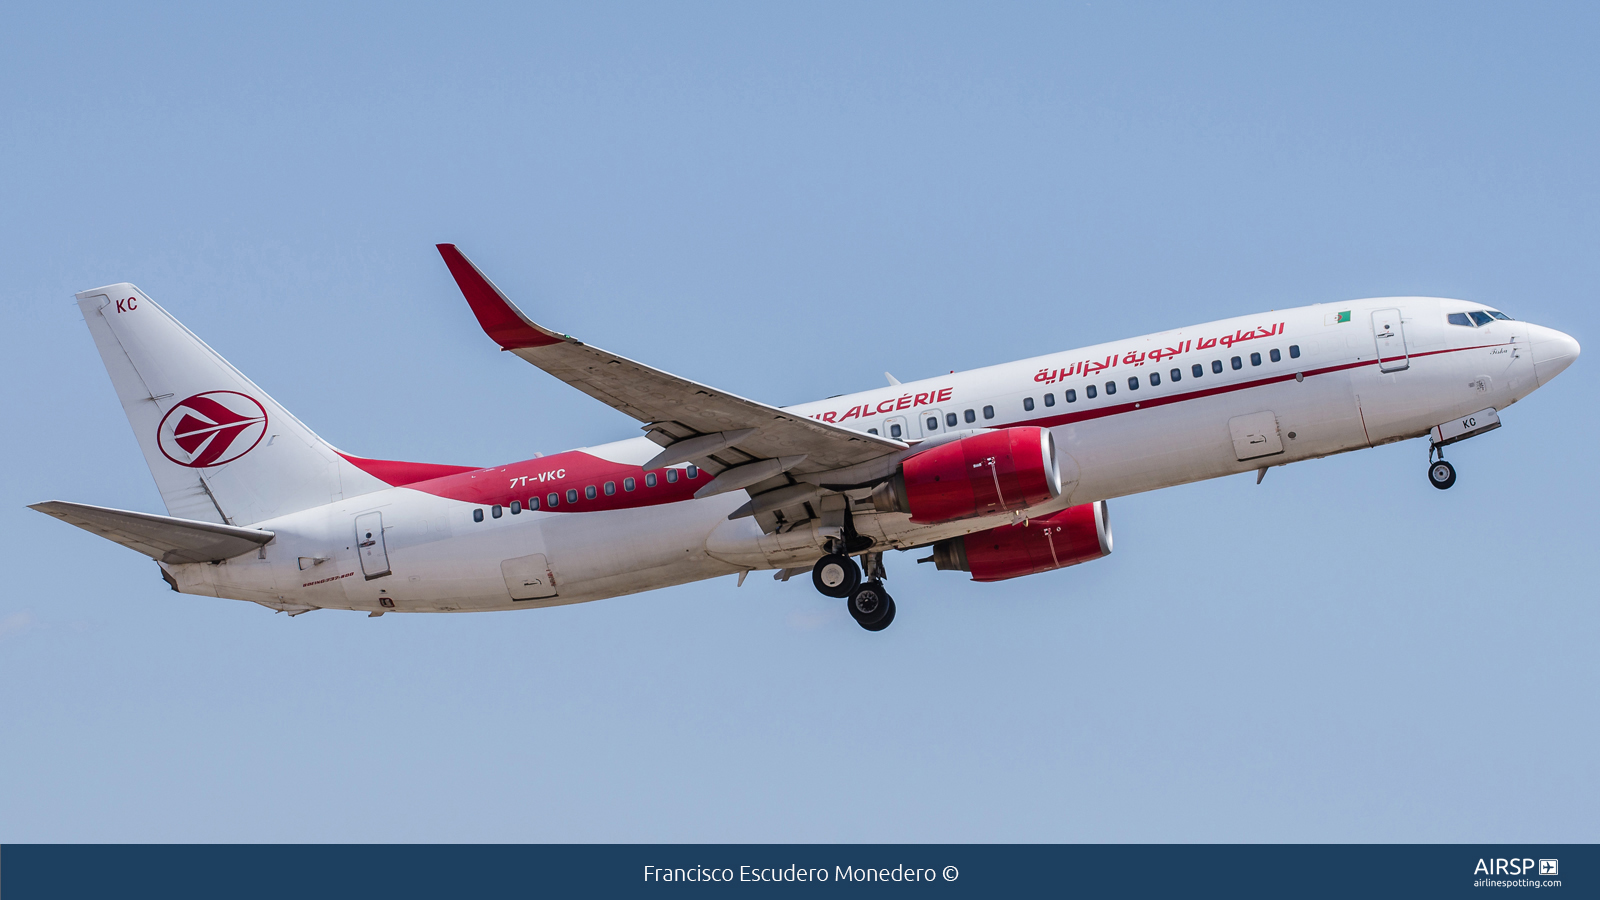 Air Algerie  Boeing 737-800  7T-VKC